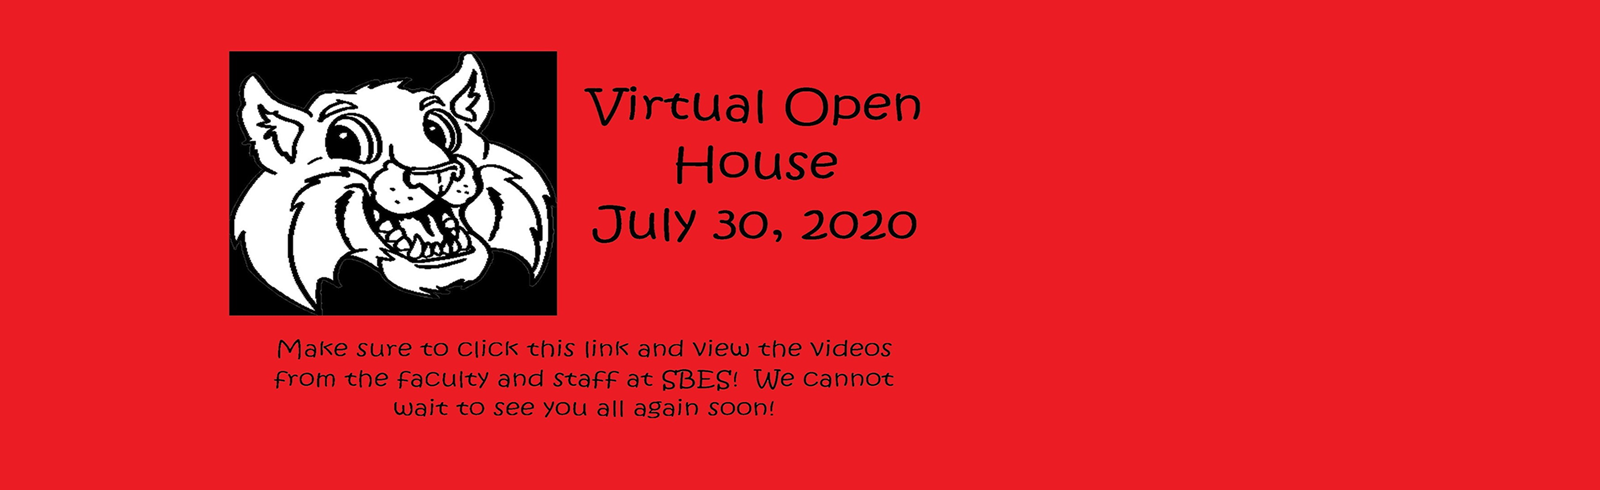 http://www.dcstn.org/VirtualOpenHouse.aspx